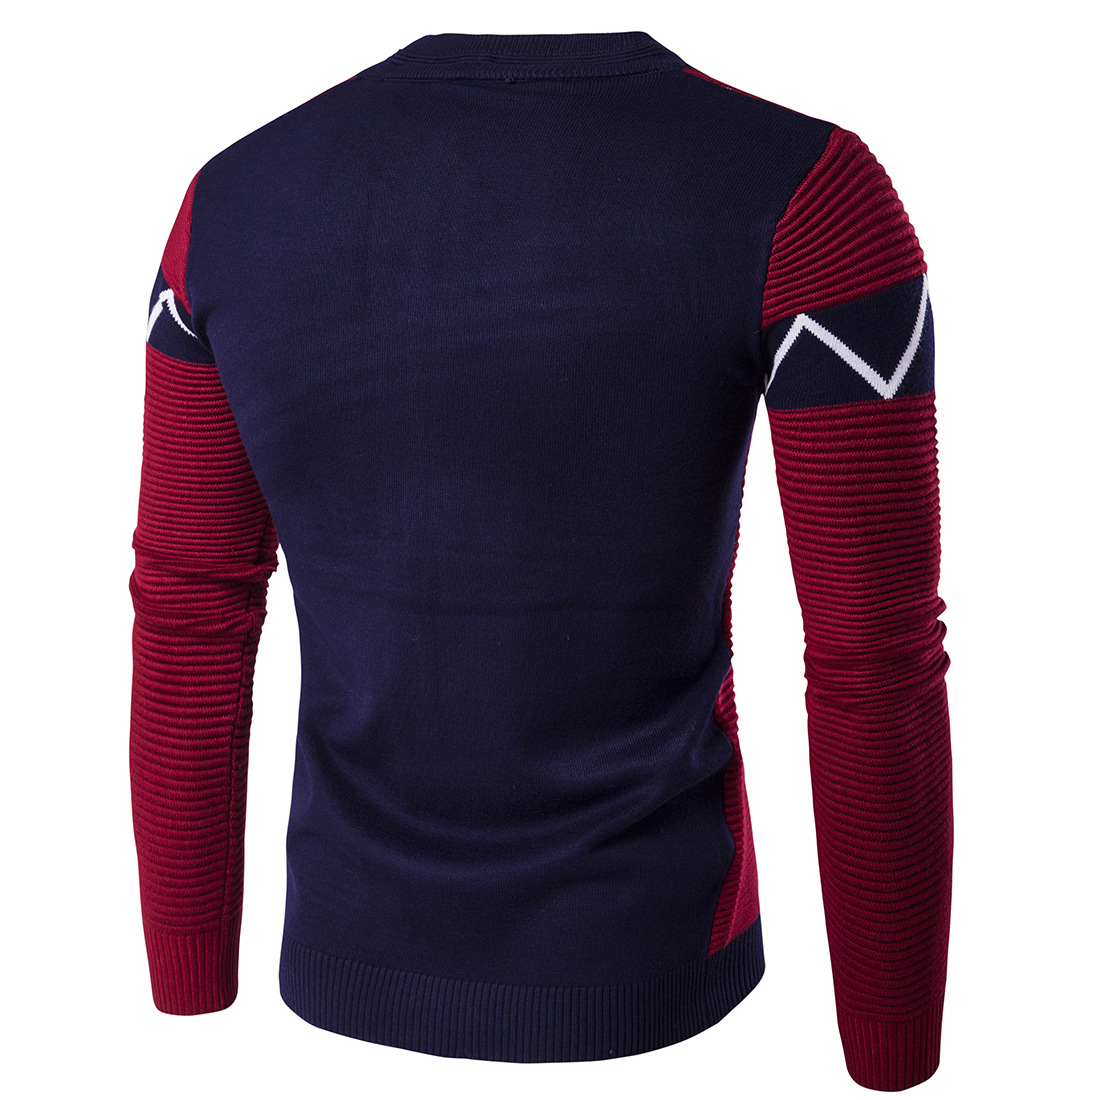 2017 New Mens Zipper Sweater Autumn Winter Cardigans Sweaters Knitwear Cardigan masculino Bblack Sweater Men christmas 2XL